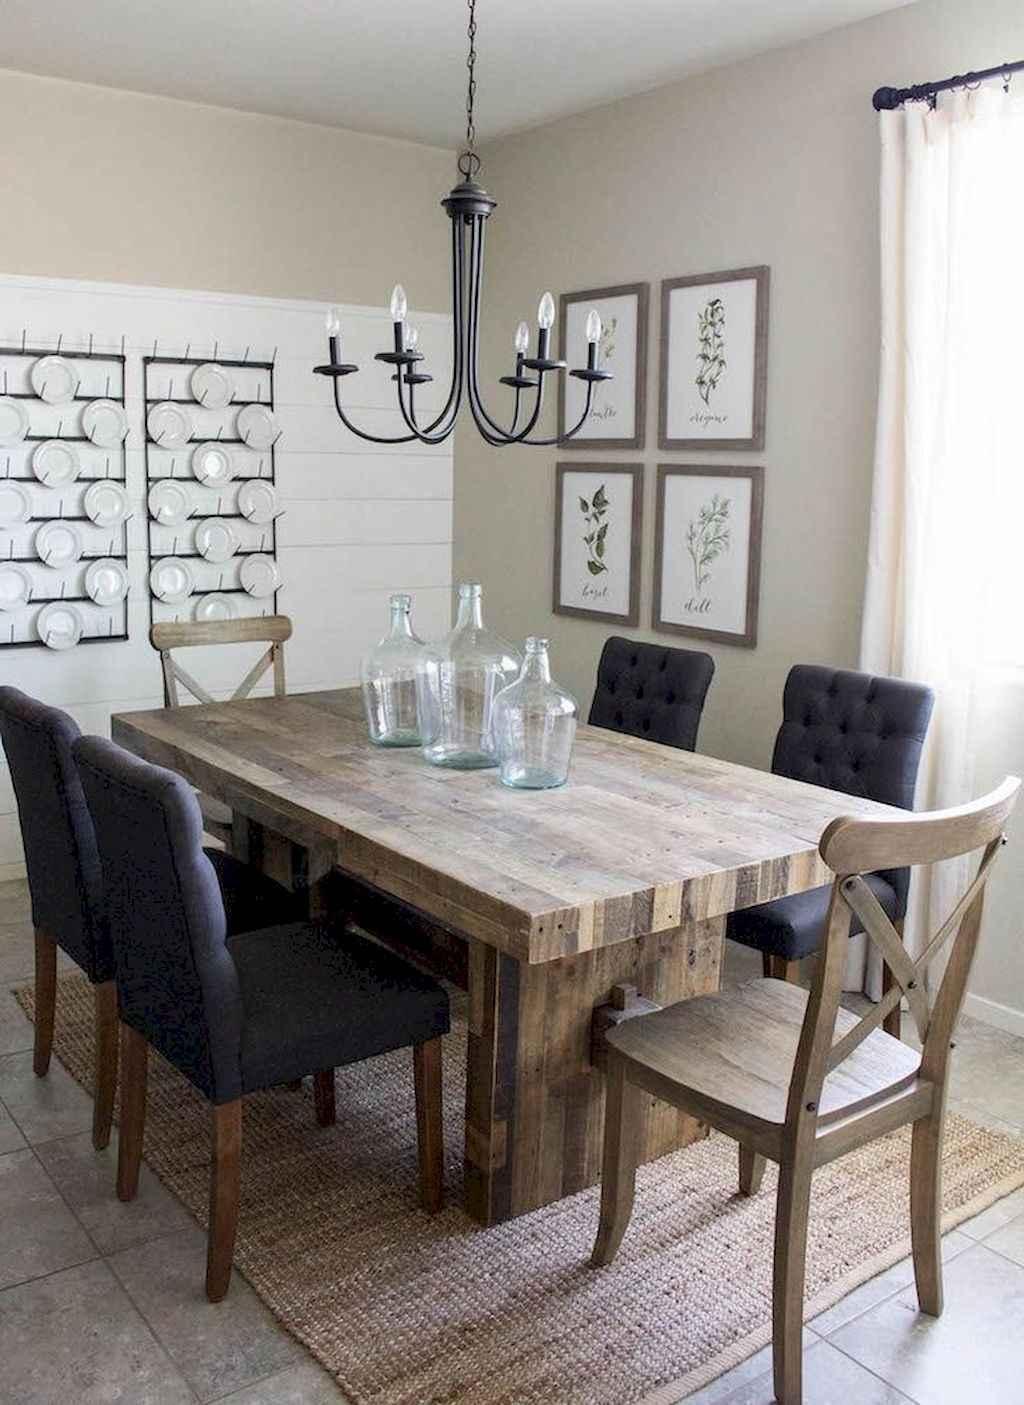 100 Rustic Farmhouse Dining Room Decor Ideas (41)